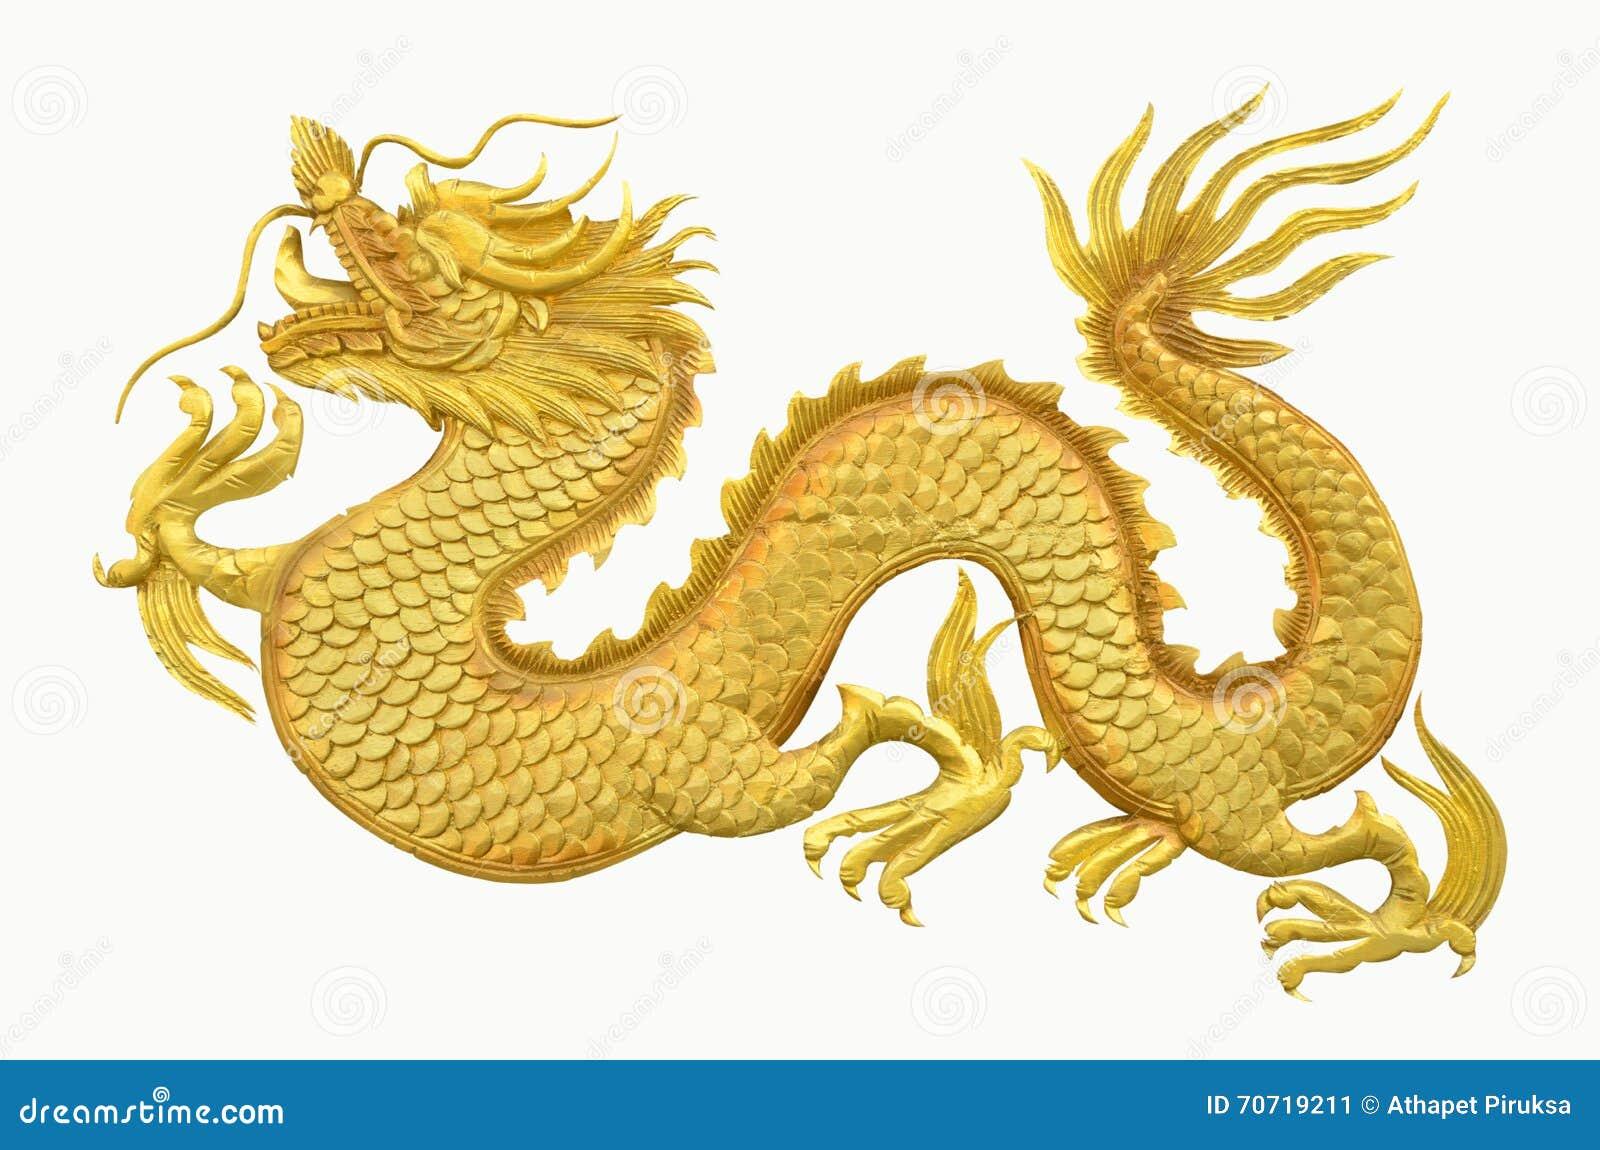 dragon d 39 or sur le fond blanc image stock image du statue chinois 70719211. Black Bedroom Furniture Sets. Home Design Ideas